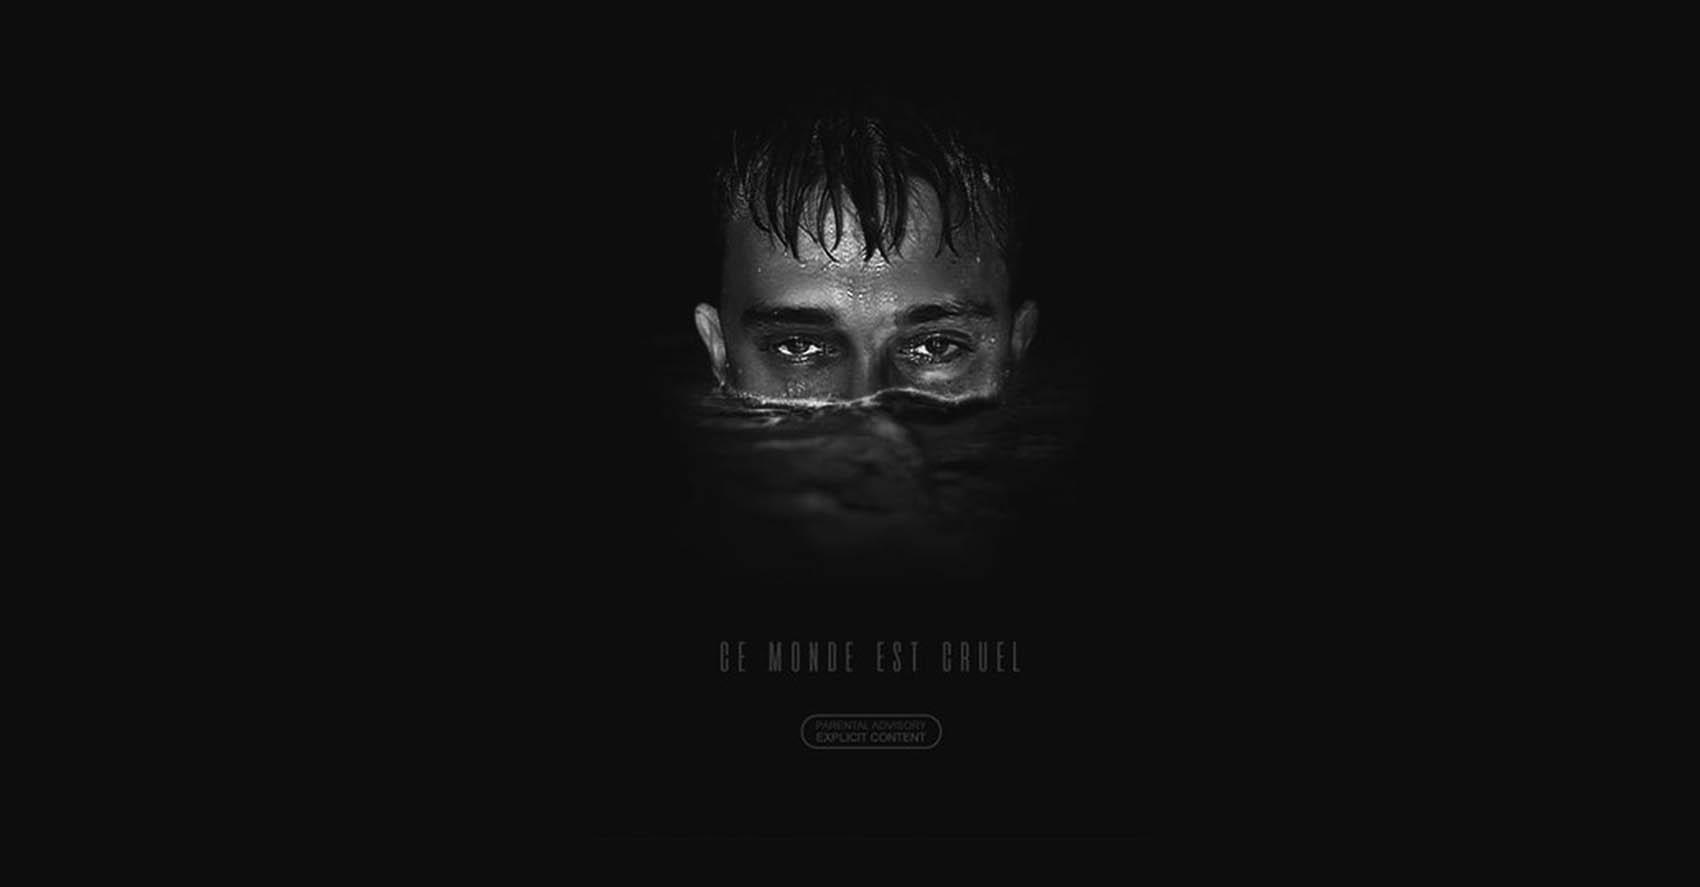 Vald : pochette de l'album ce monde est cruel